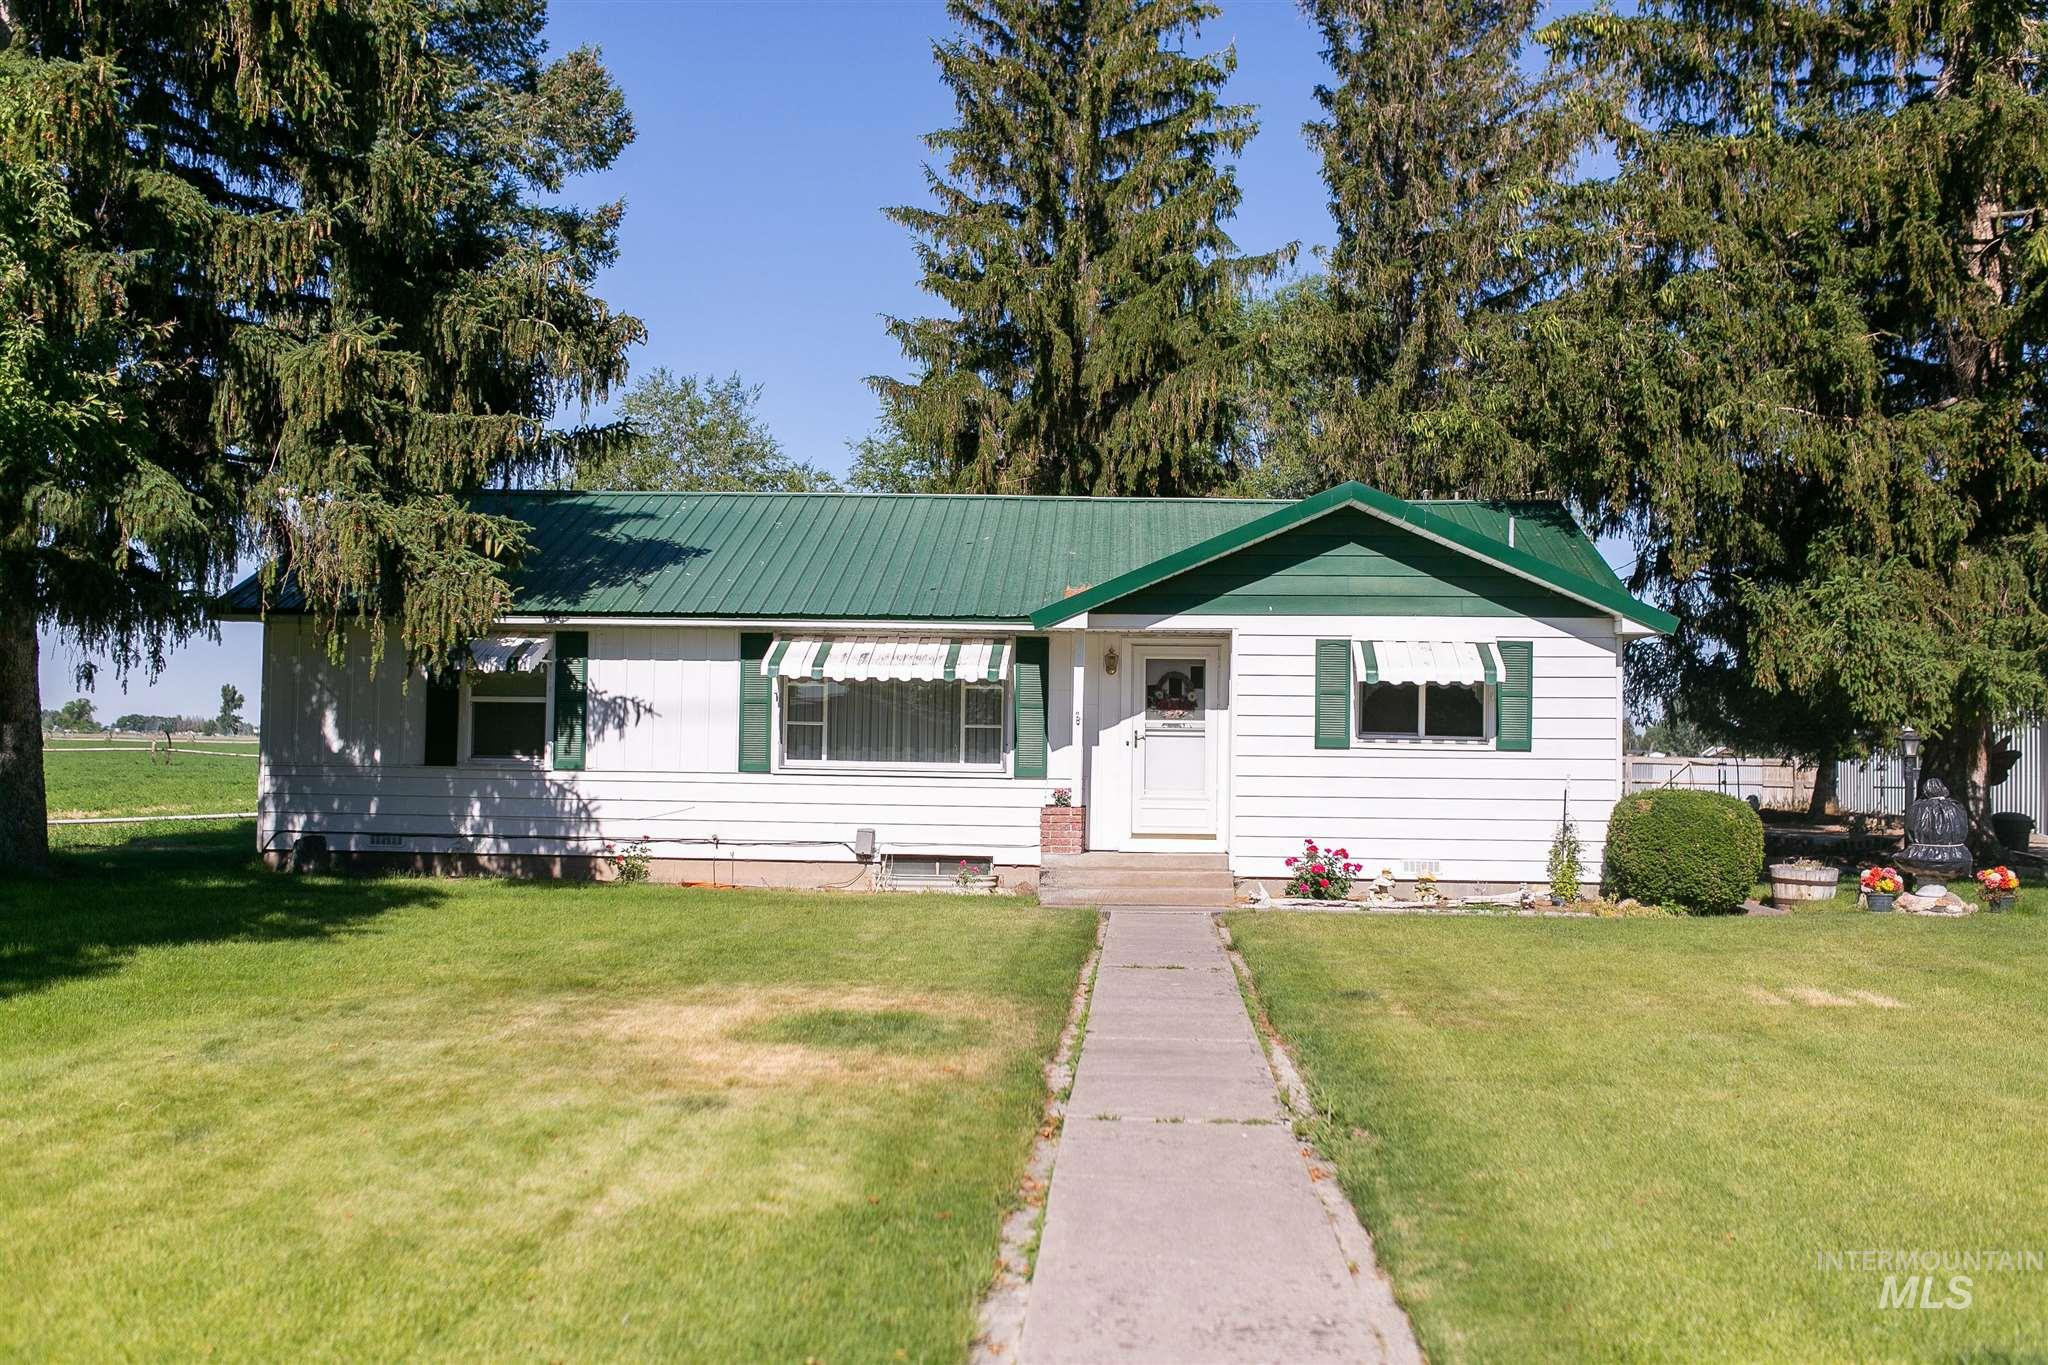 87 N 100 W Property Photo